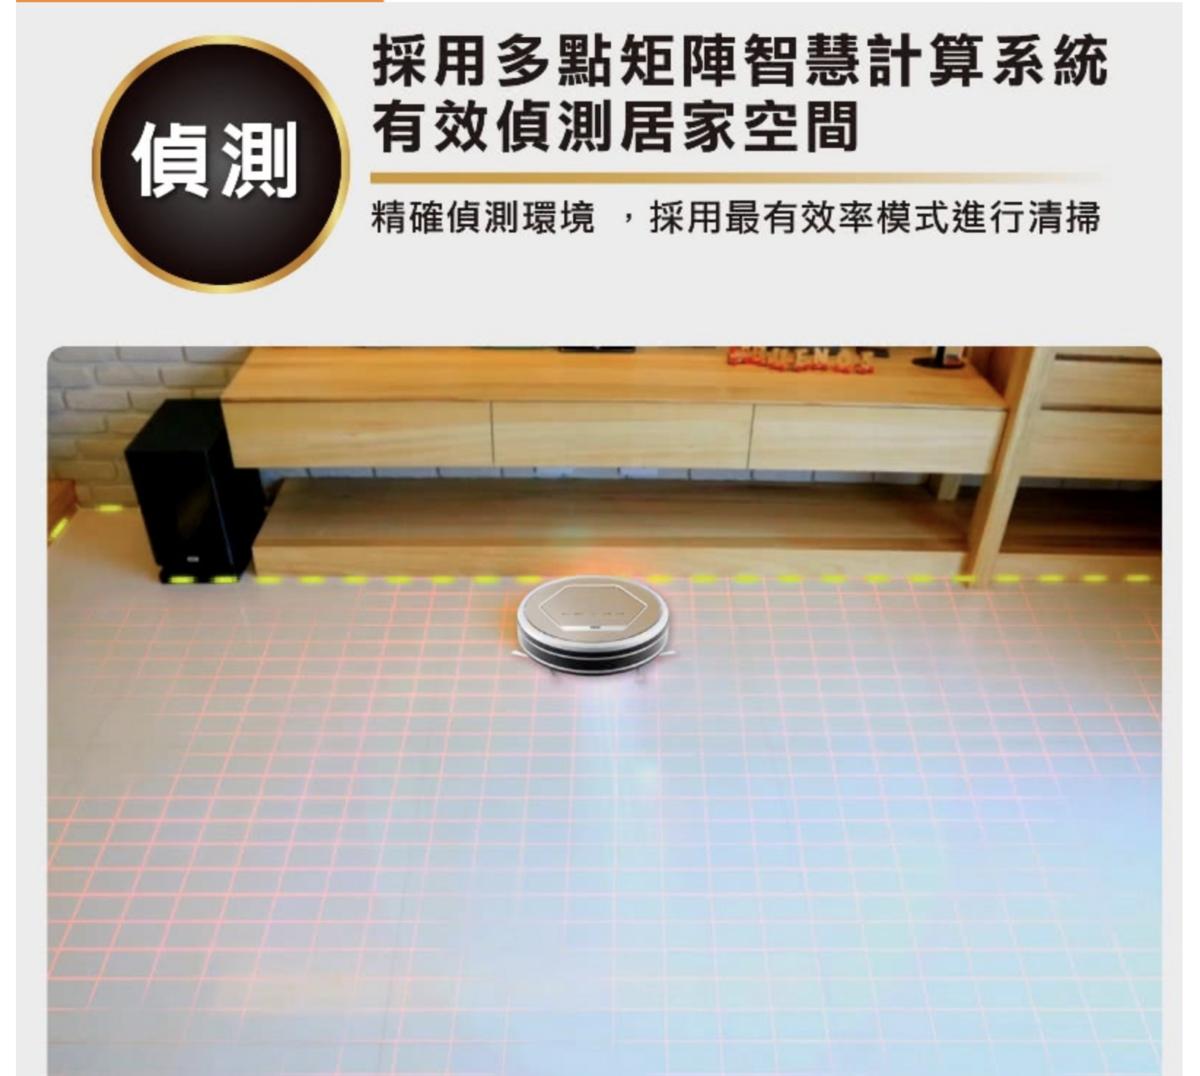 【SABA】智慧型機器人掃吸拖地吸塵器(SA-HV02DS)團購價|不用破萬元的掃吸拖機器人,超聰明、超感應、還有紫外線滅菌功能!